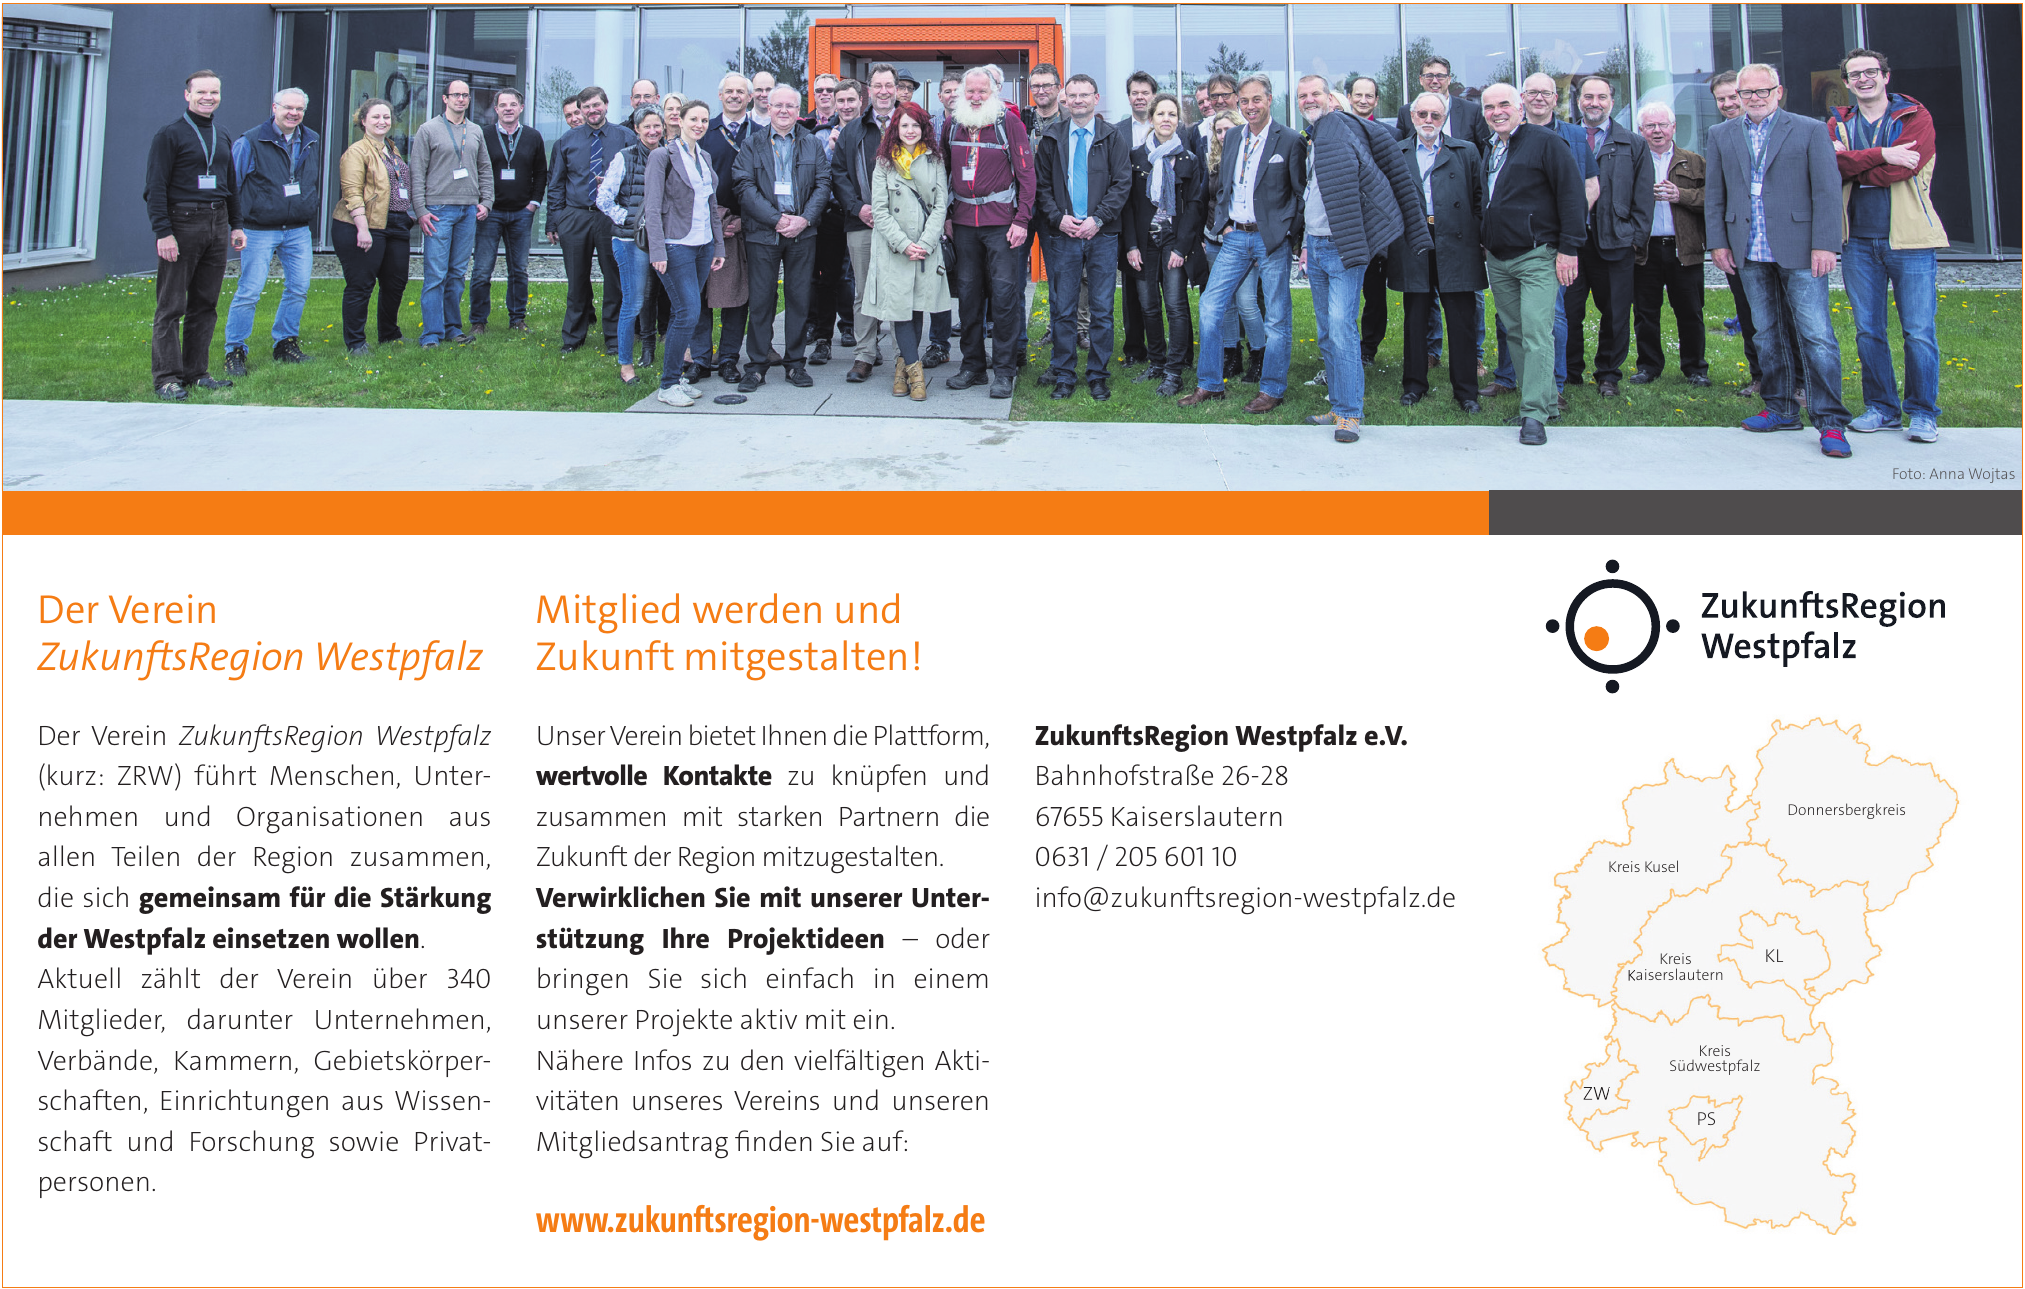 ZukunftsRegion Westpfalz e .V.